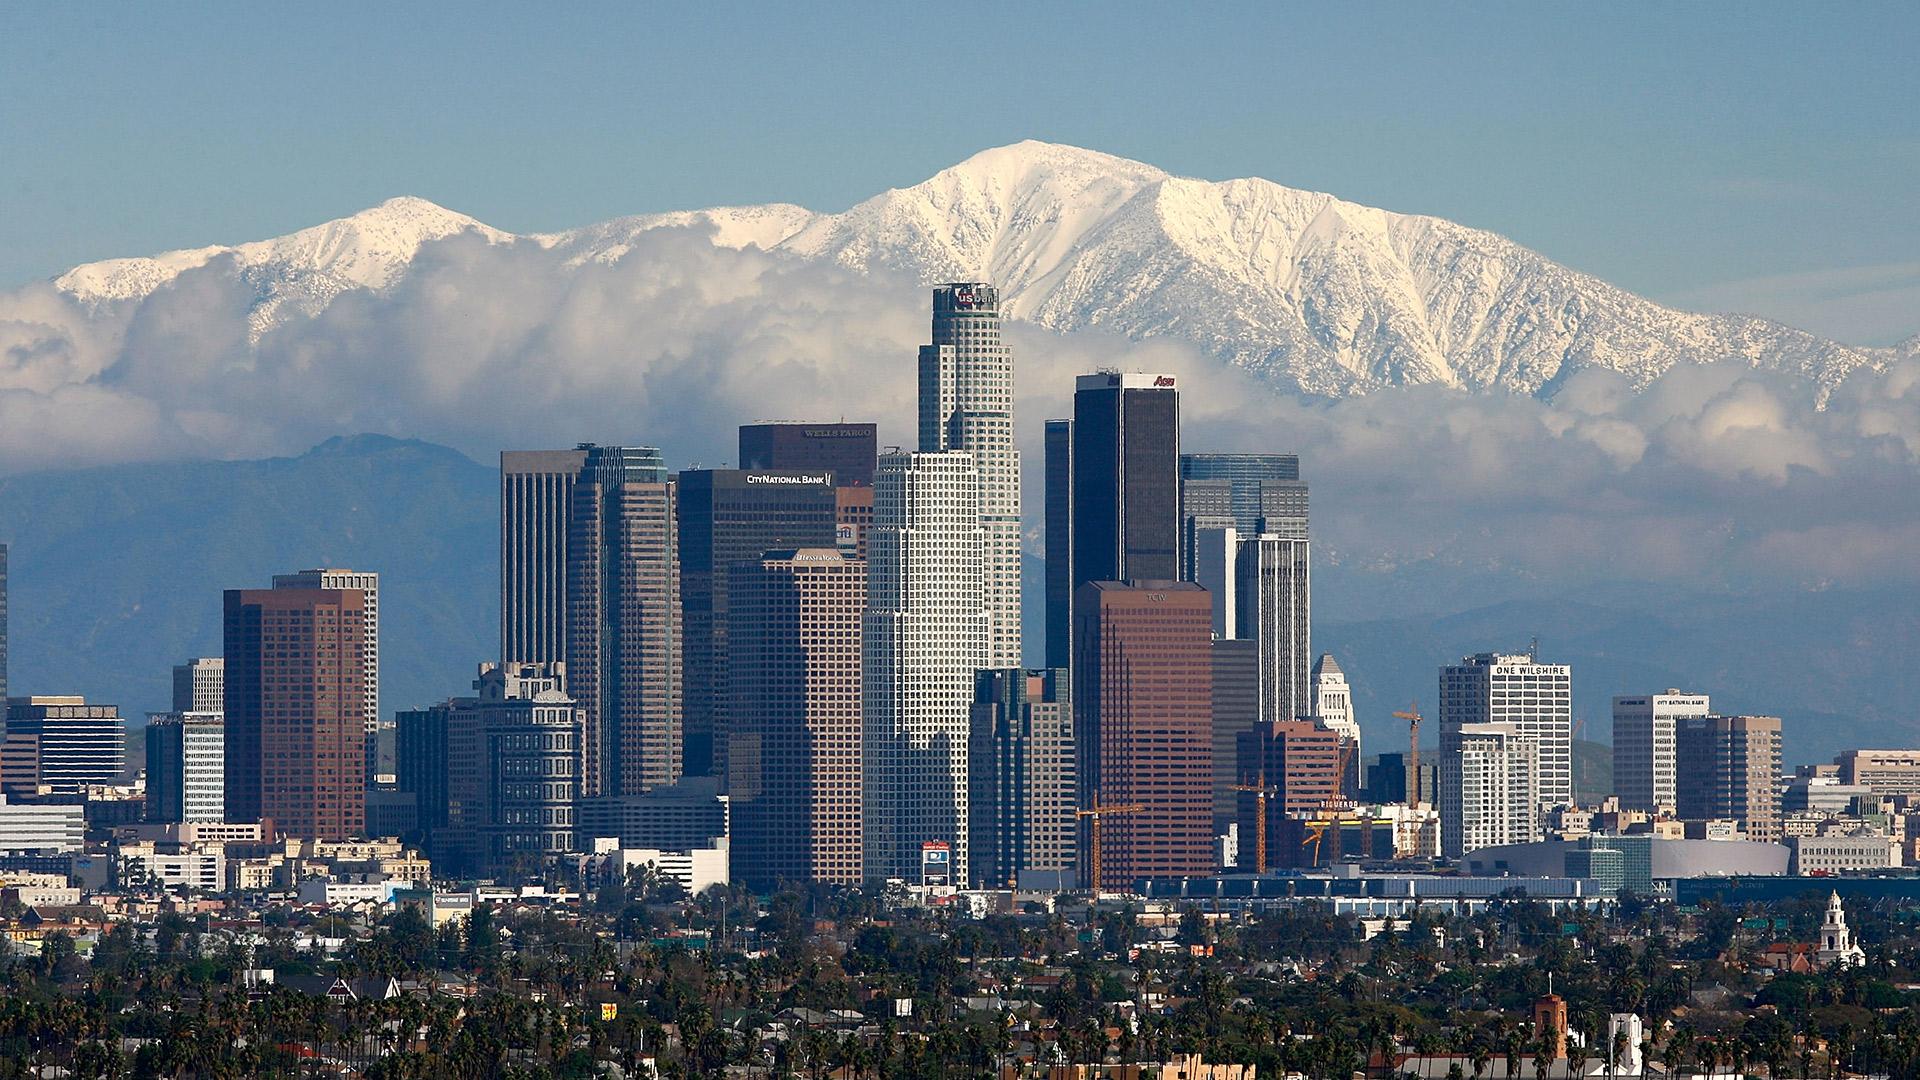 Los Angeles | Sheknows.com